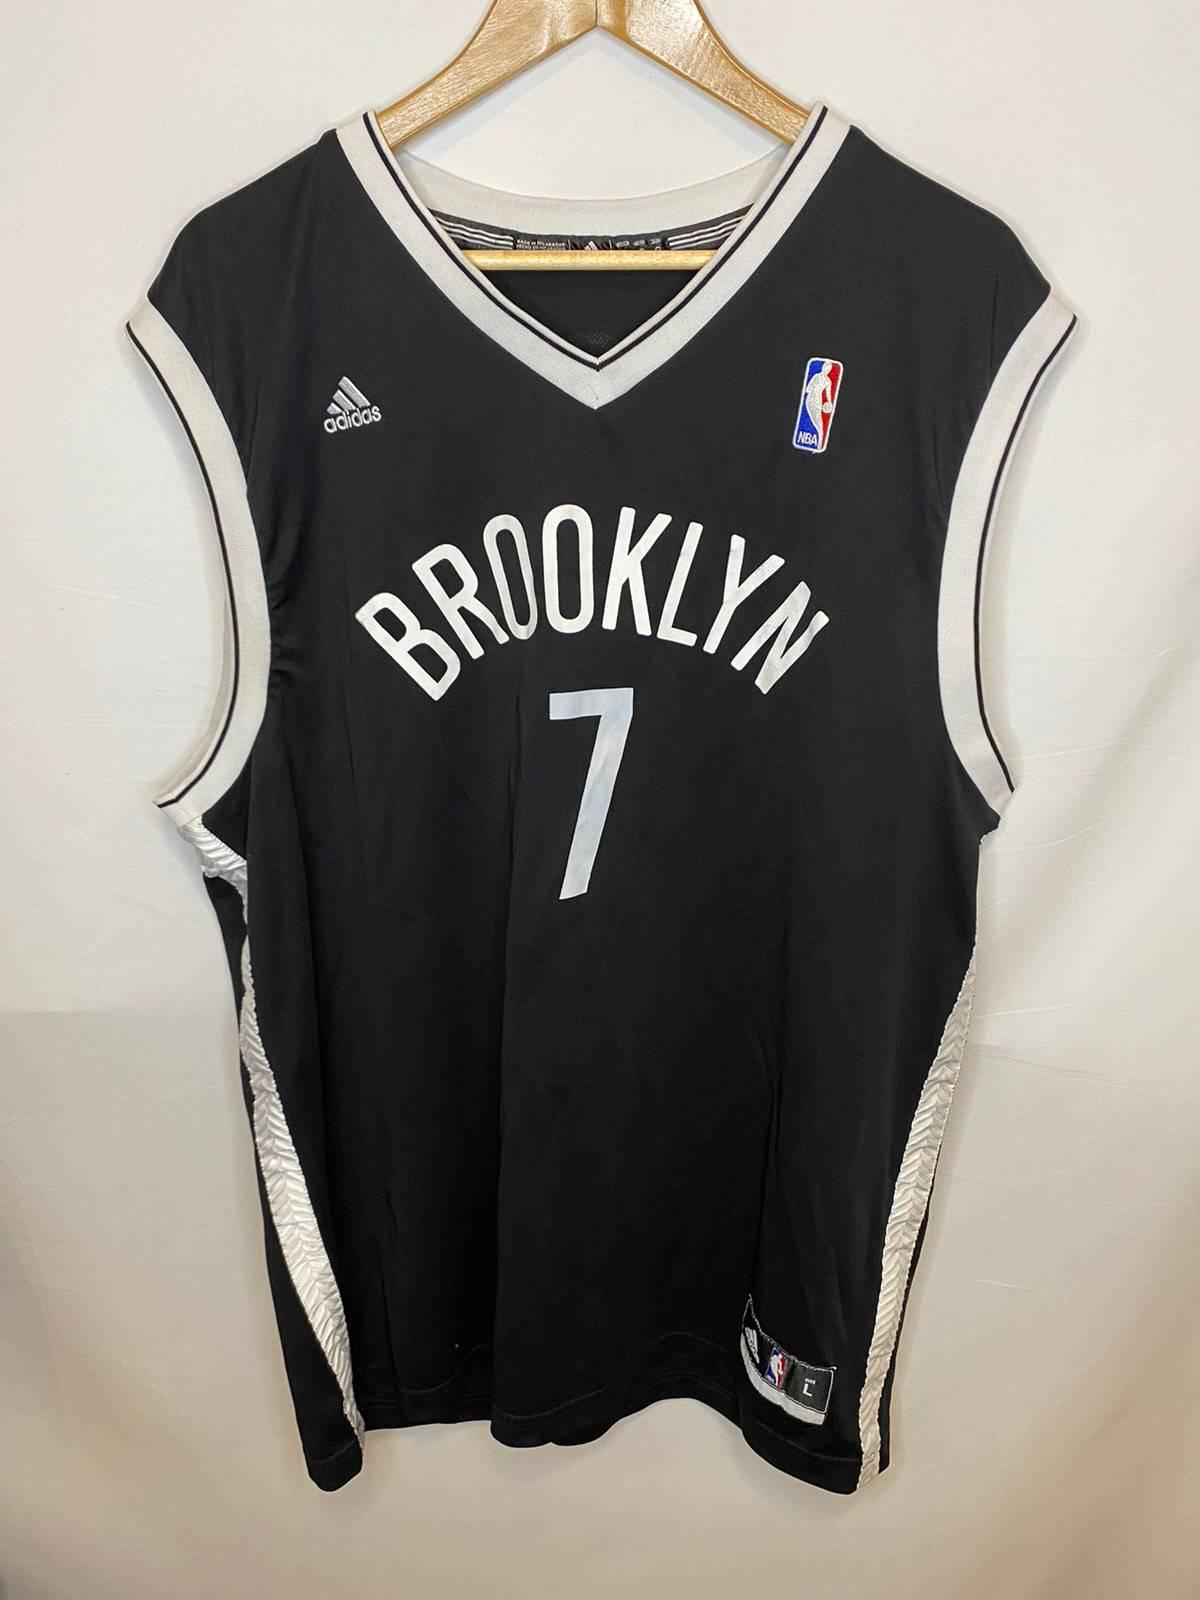 Adidas Brooklyn Nets Joe Johnson Jersey!